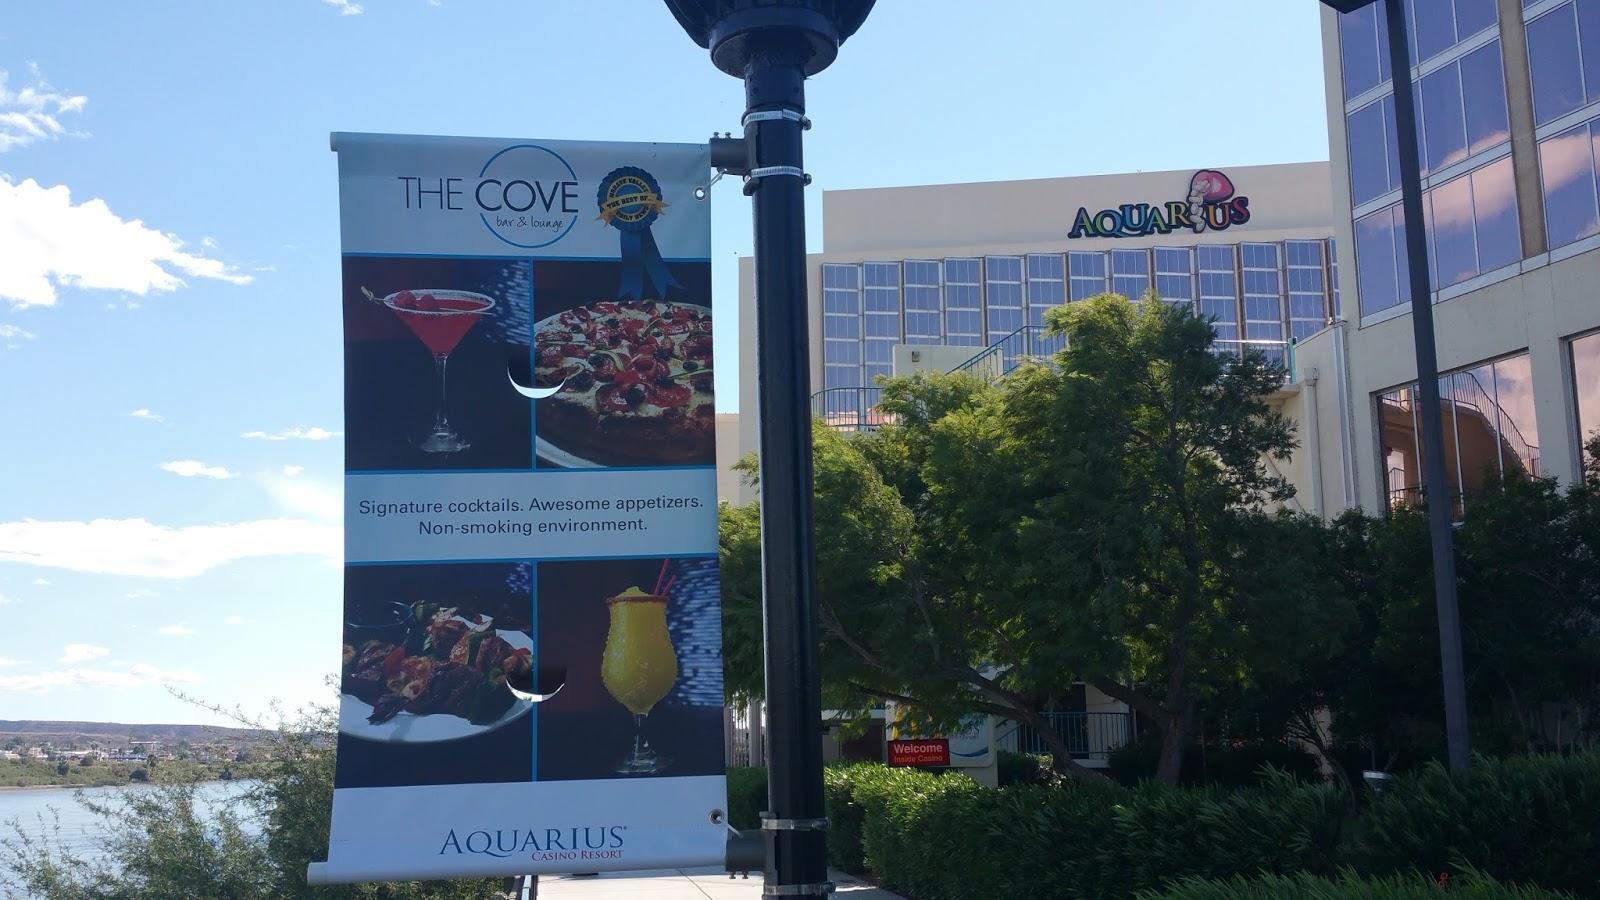 laughlin buzz 3rd quarter revenue up at aquarius casino